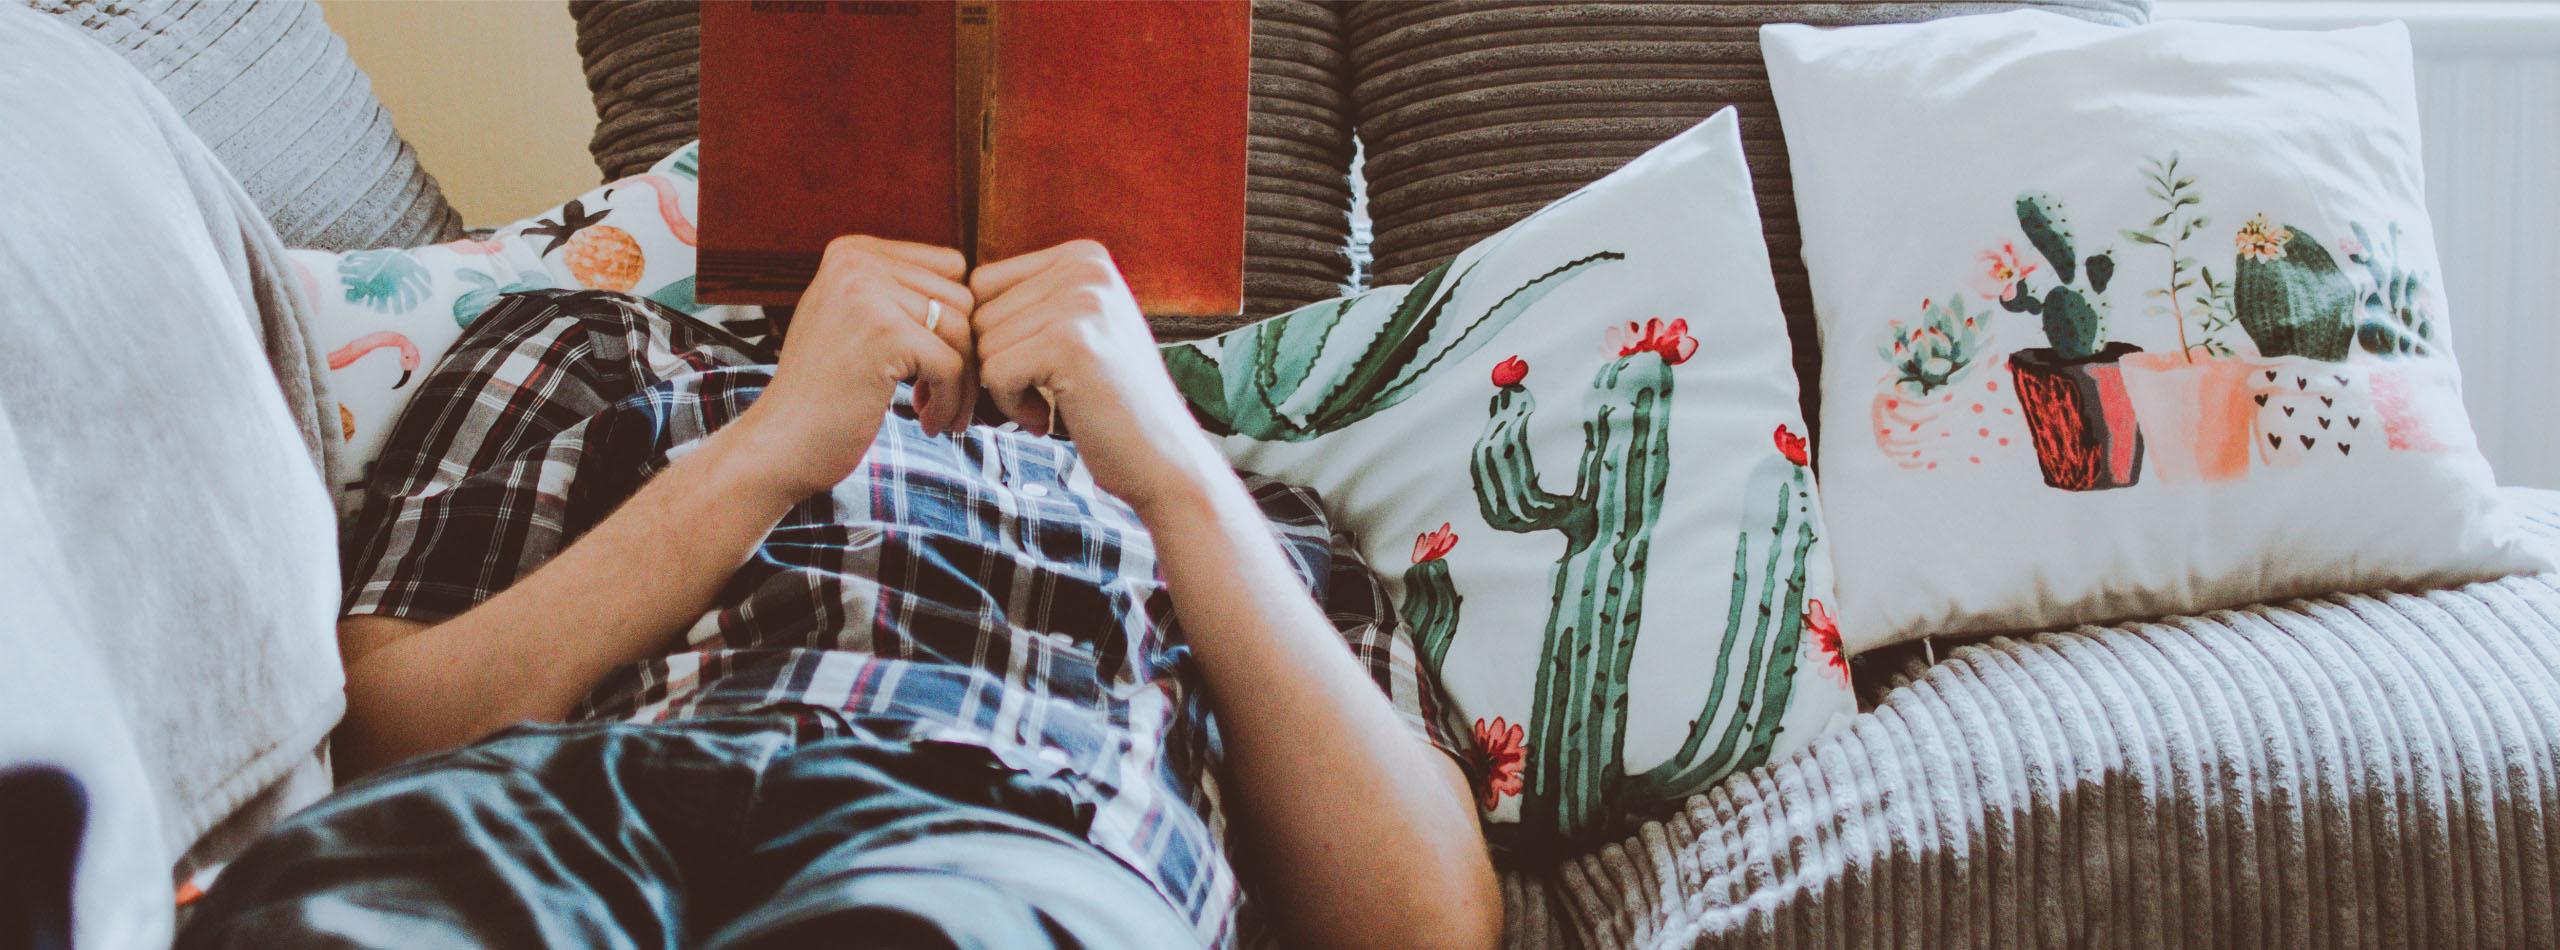 Man reading next to custom printed cotton linen canvas pillows